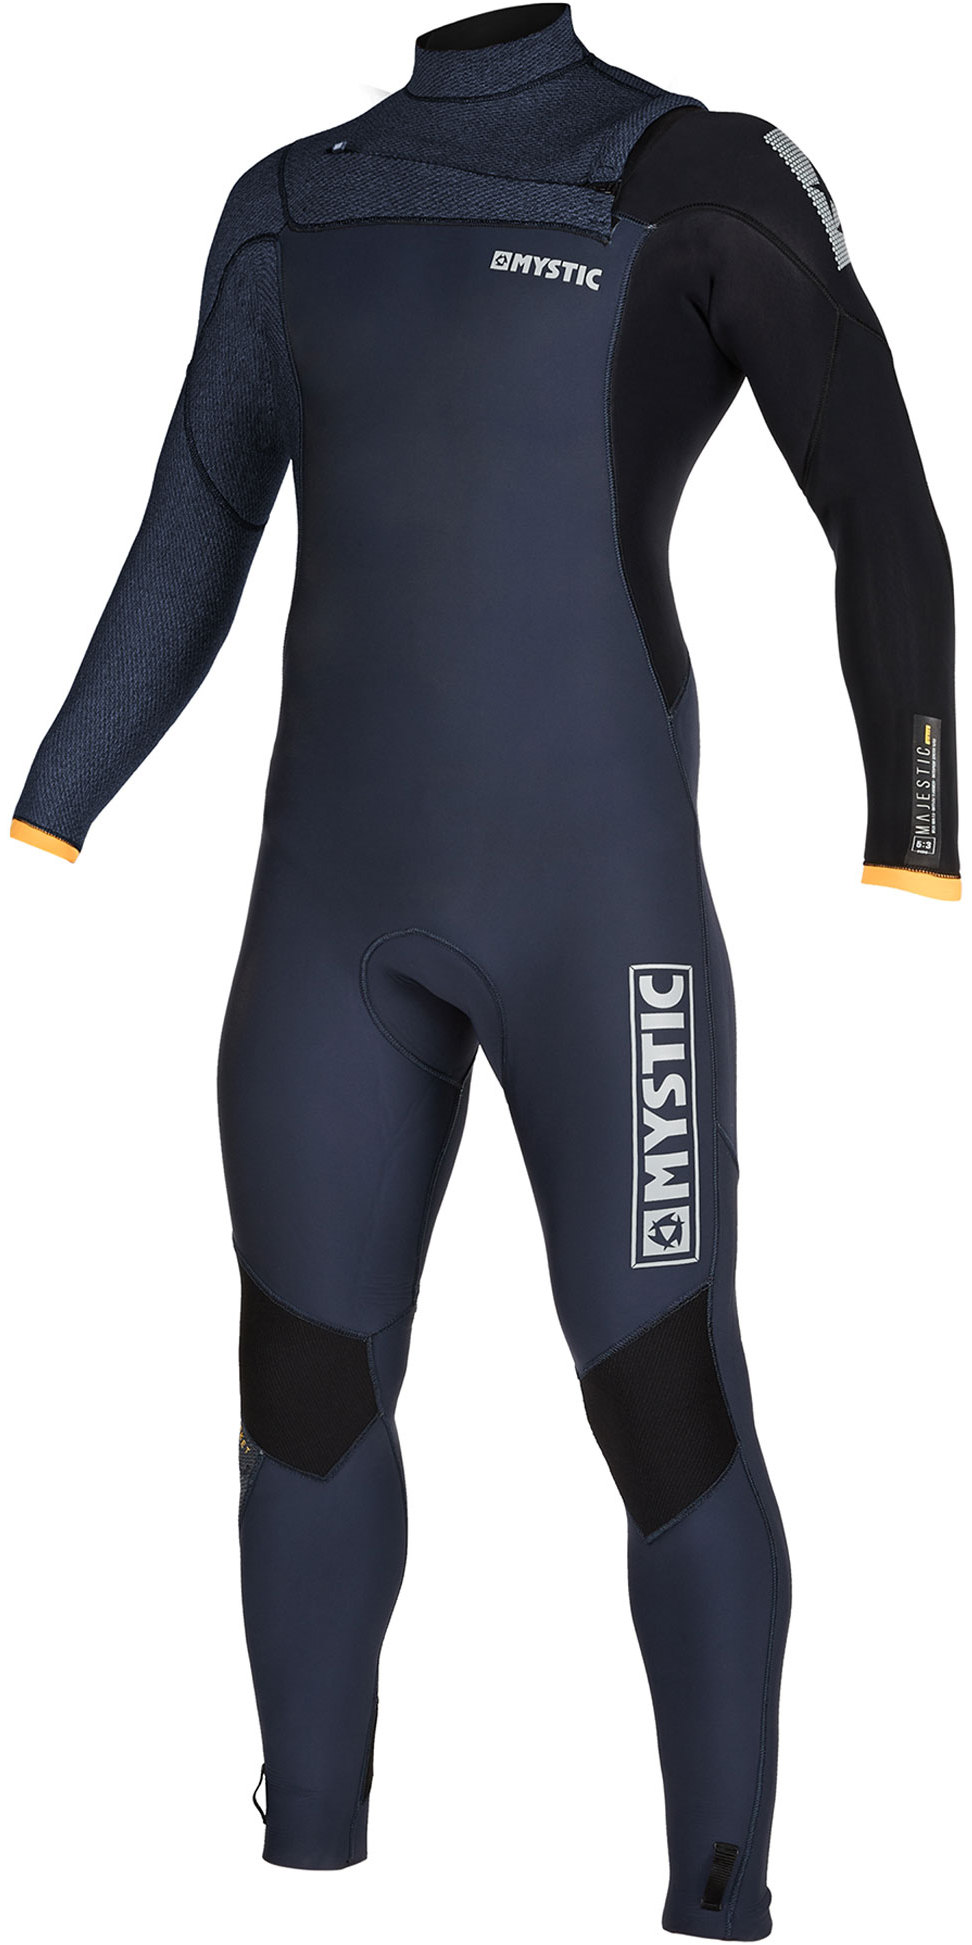 2019 Mystic Mannen Majestic 5/4/3mm Chest Zip Wetsuit 200002 - Navy